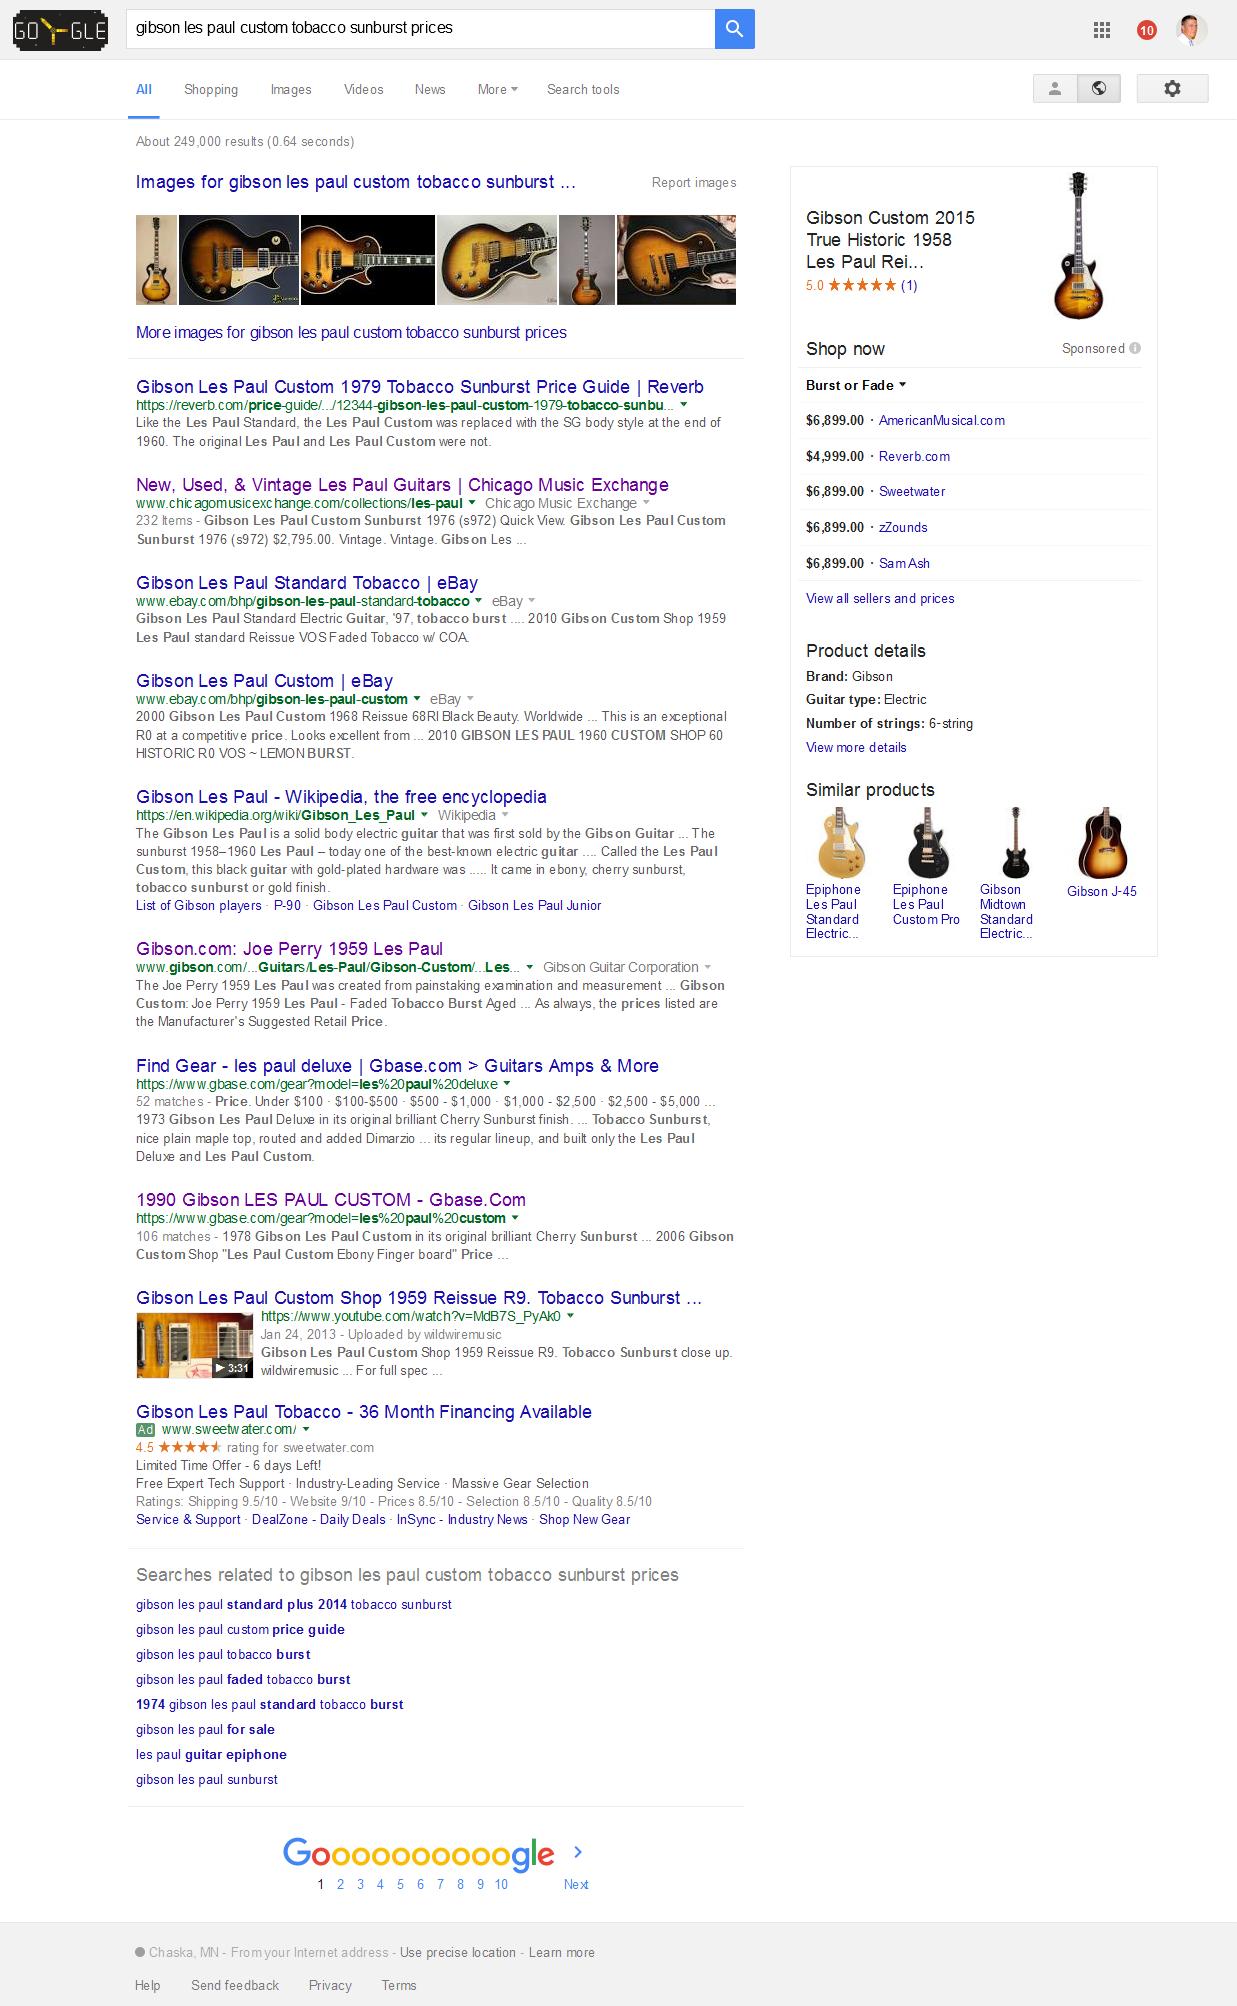 Screenshot - Gibson Les Paul Custom Tobacco Sunburst Prices - Google SERPS - 2016-07-05